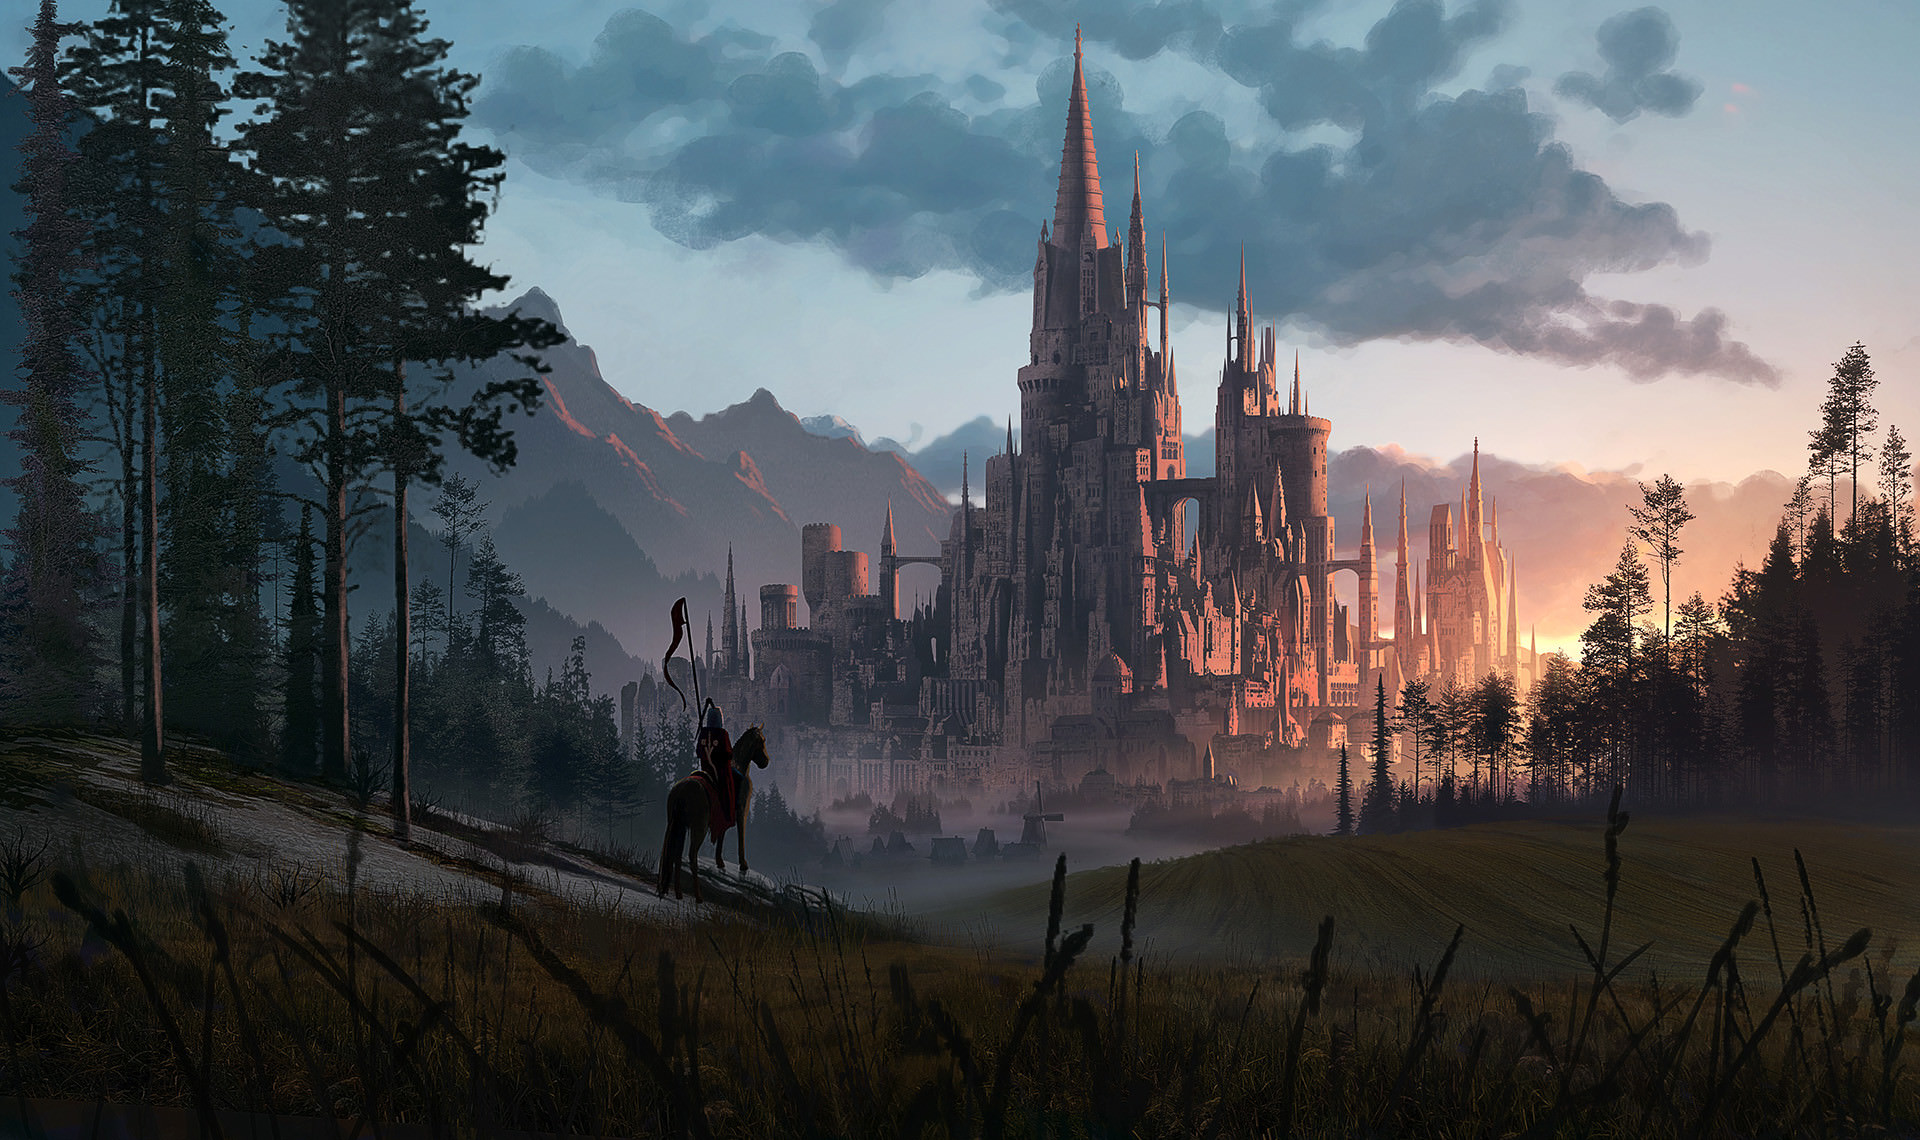 Рыцарь у средневекового замка рыцарь лошадь замок закат